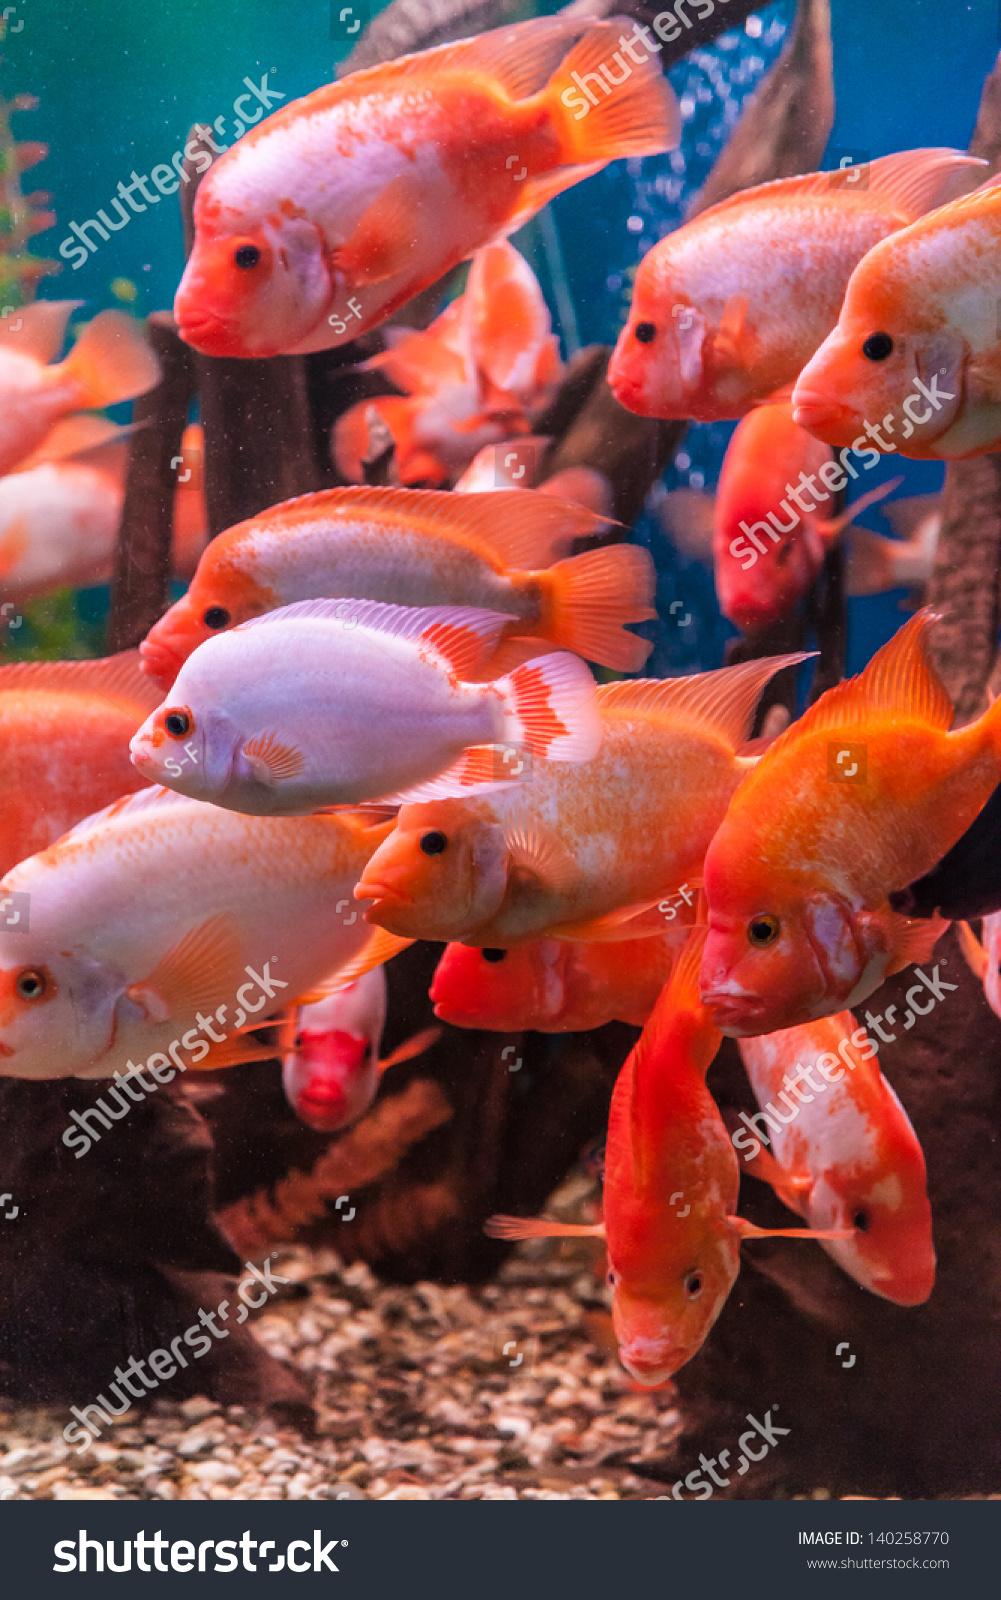 Tropical Freshwater Aquarium Big Red Fish Stock Photo (Royalty Free ...